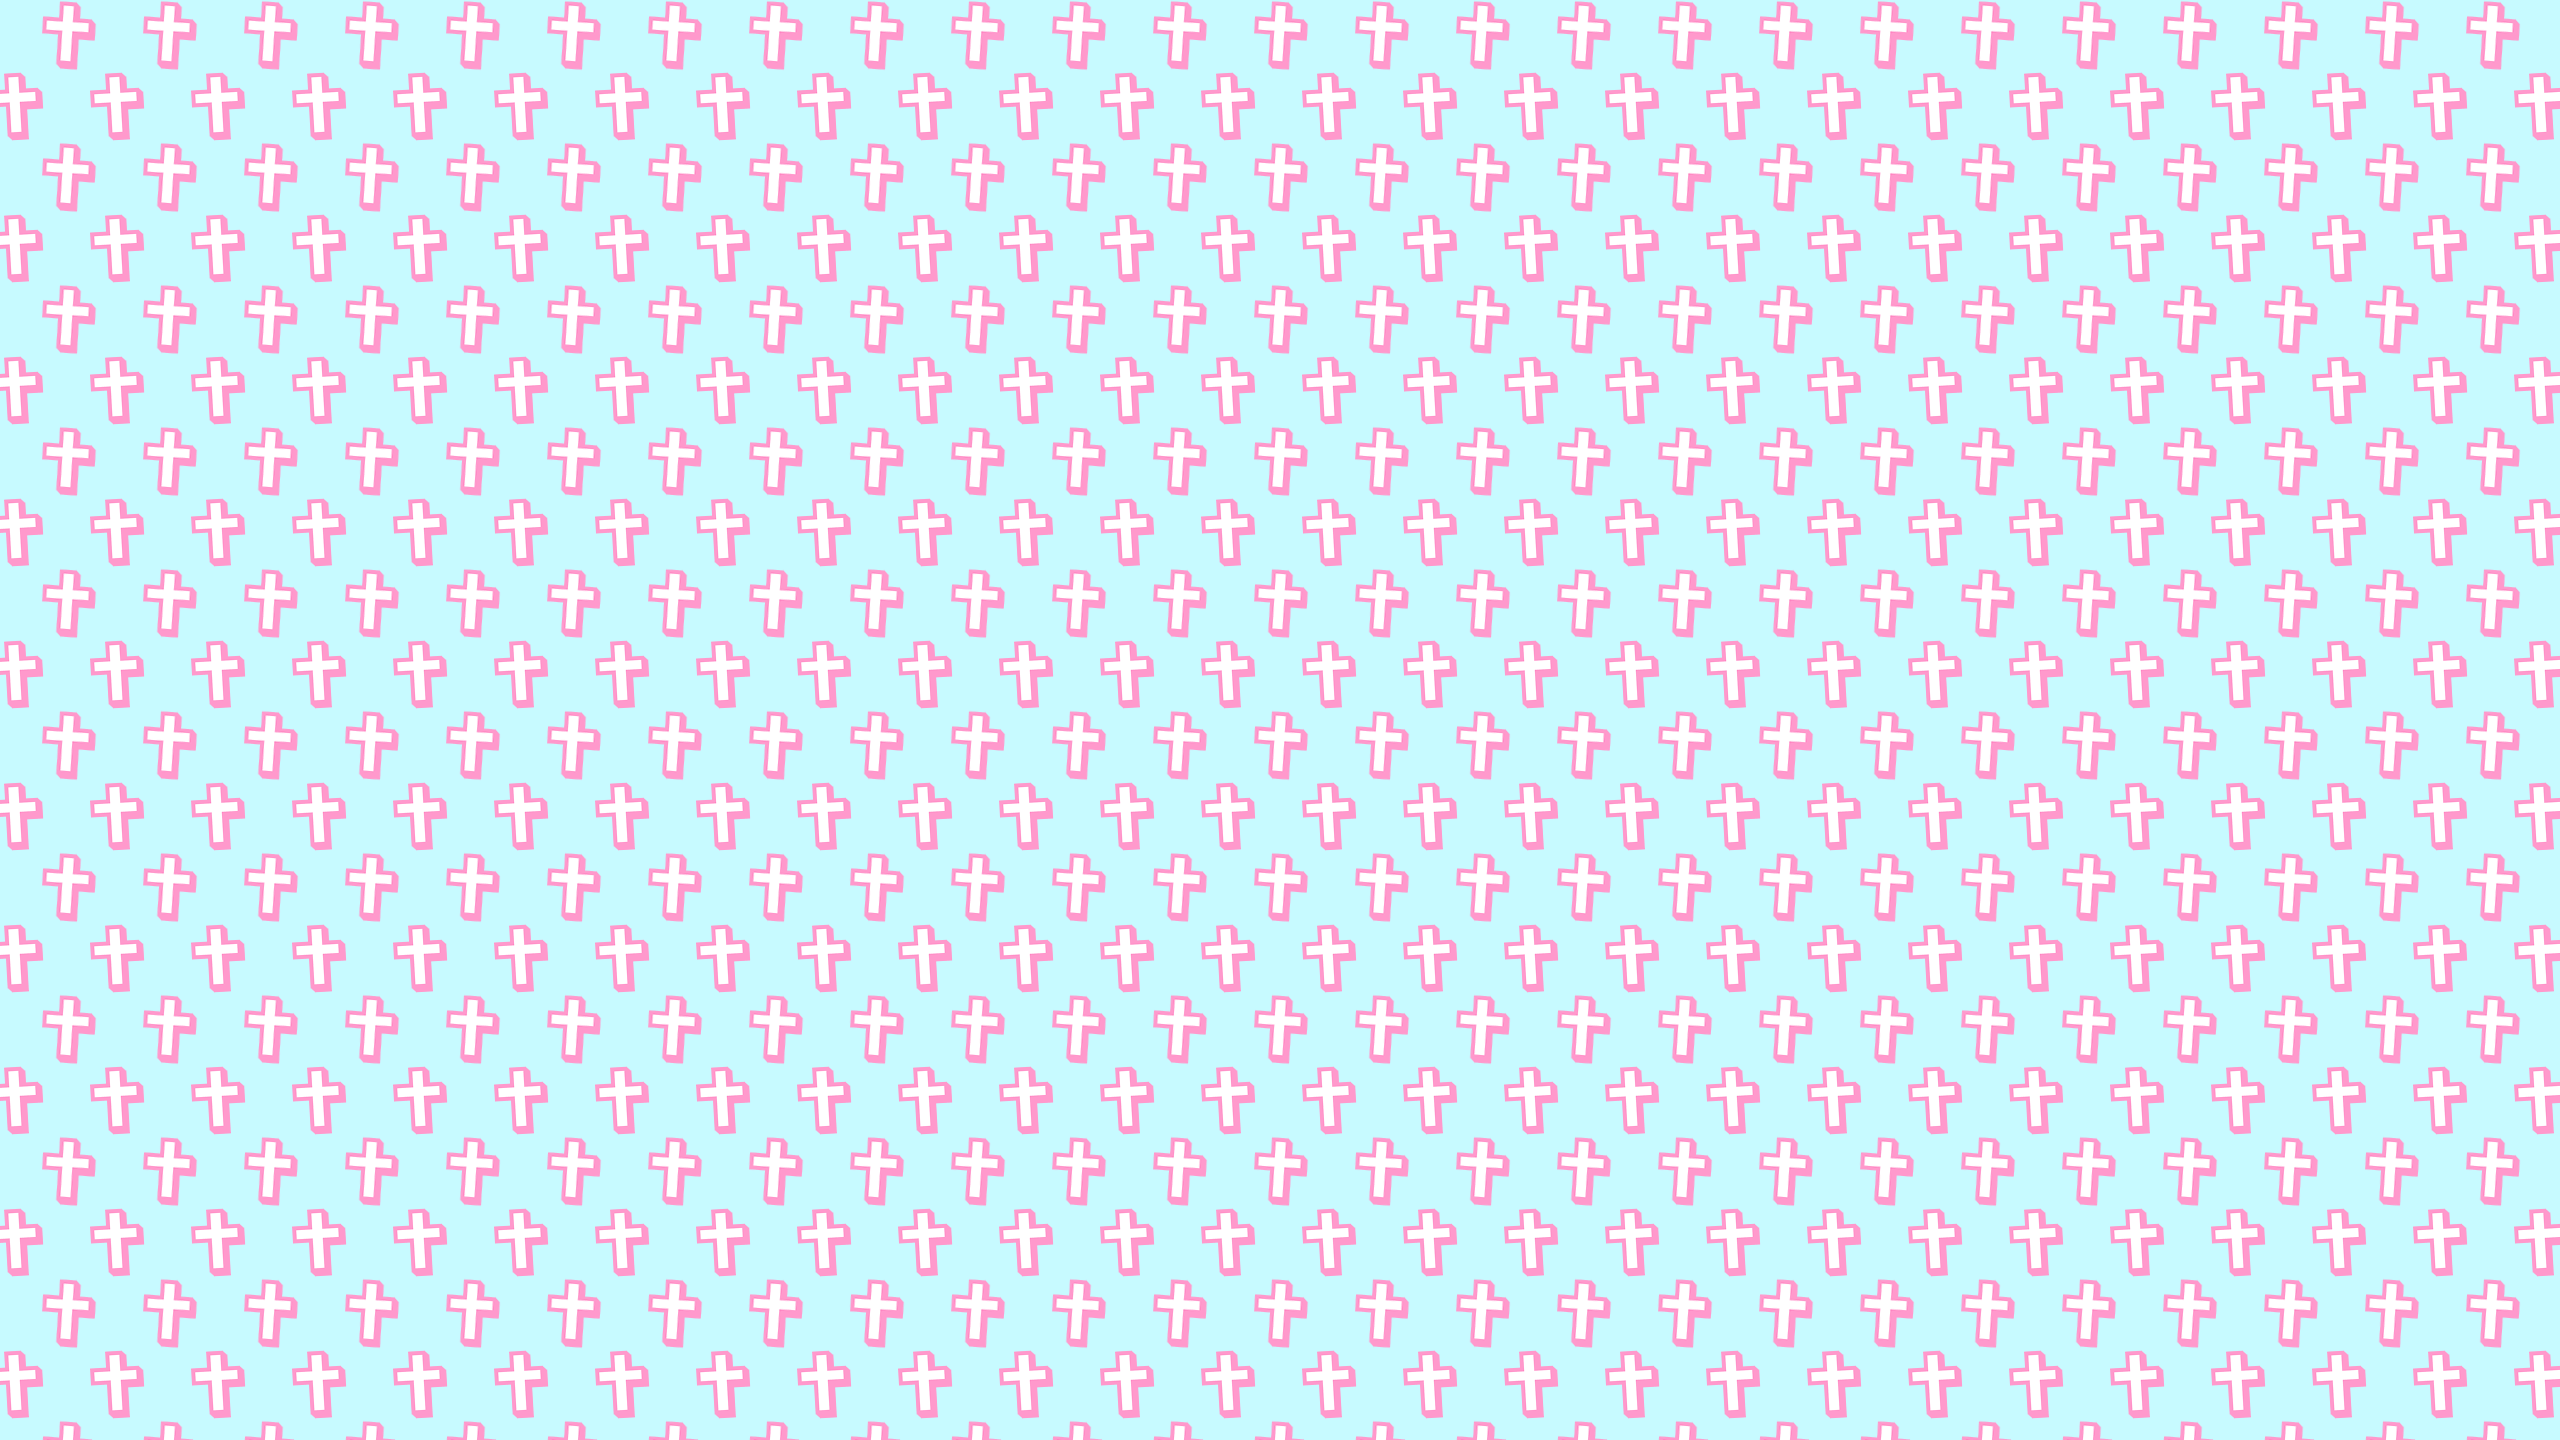 Cute Crosses Background Wallpaper Desktop Wallpapers